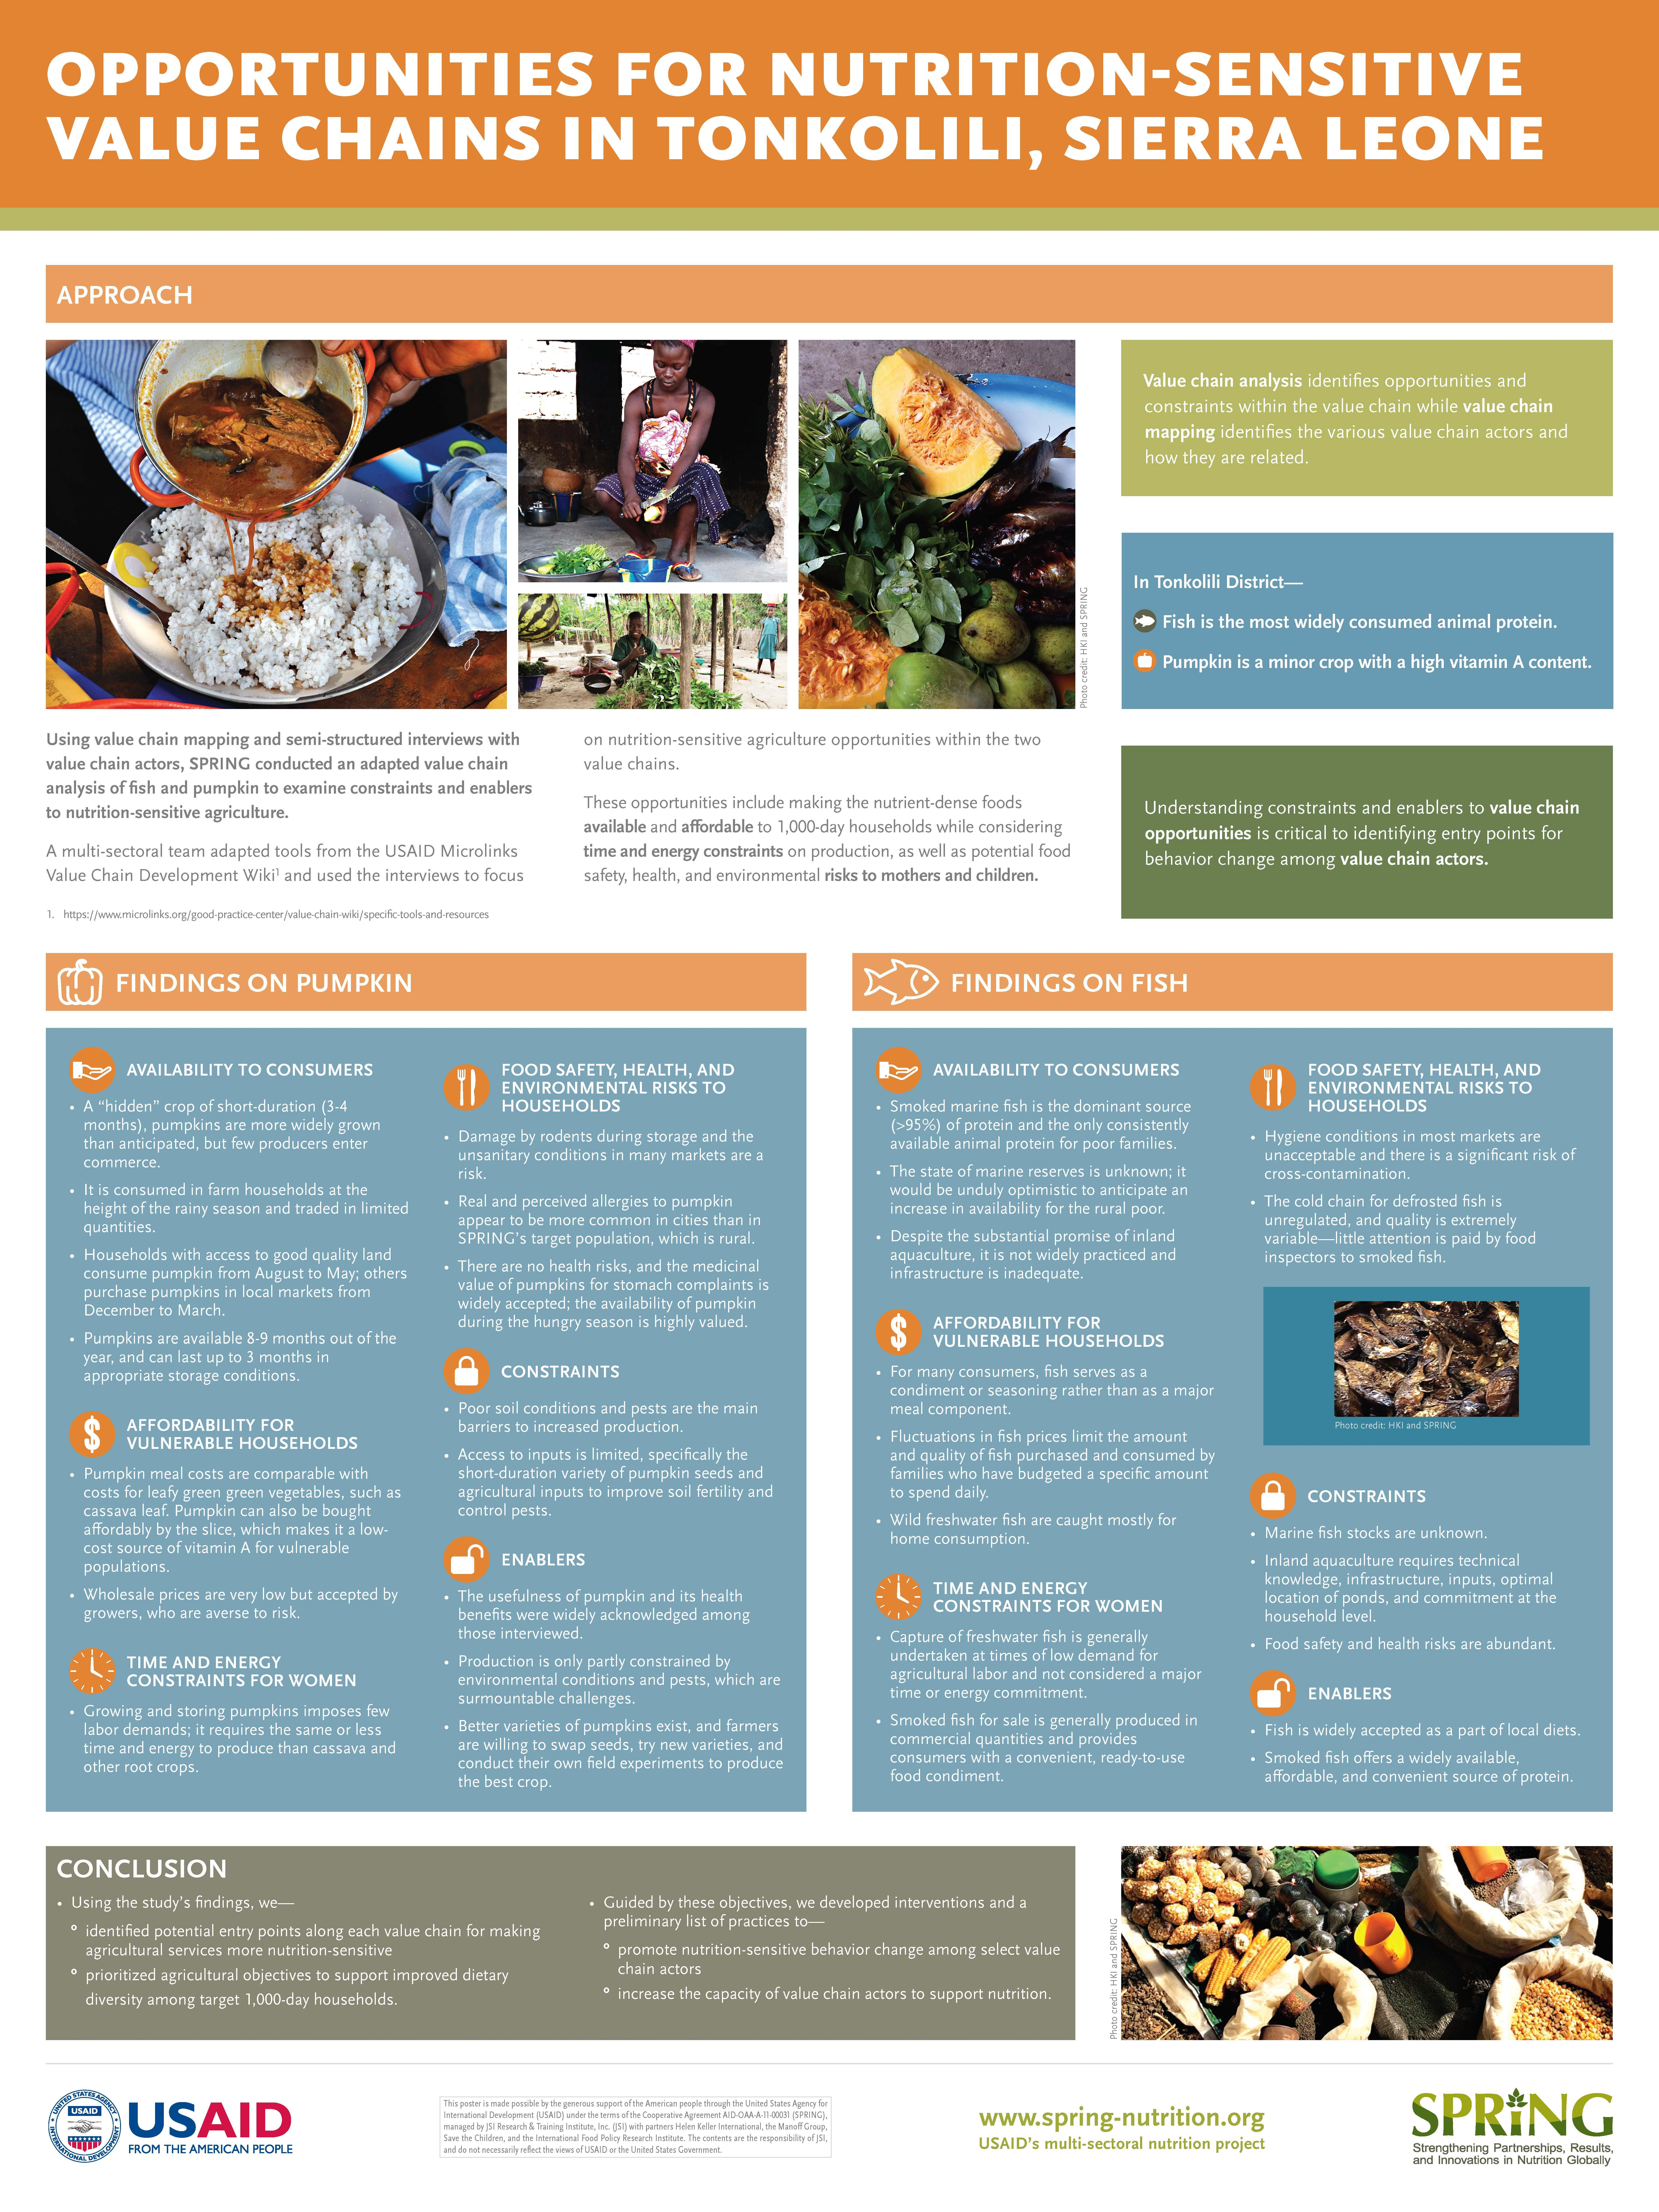 Opportunities for Nutrition-Sensitive Value Chains in Tonkolili, Sierra Leone